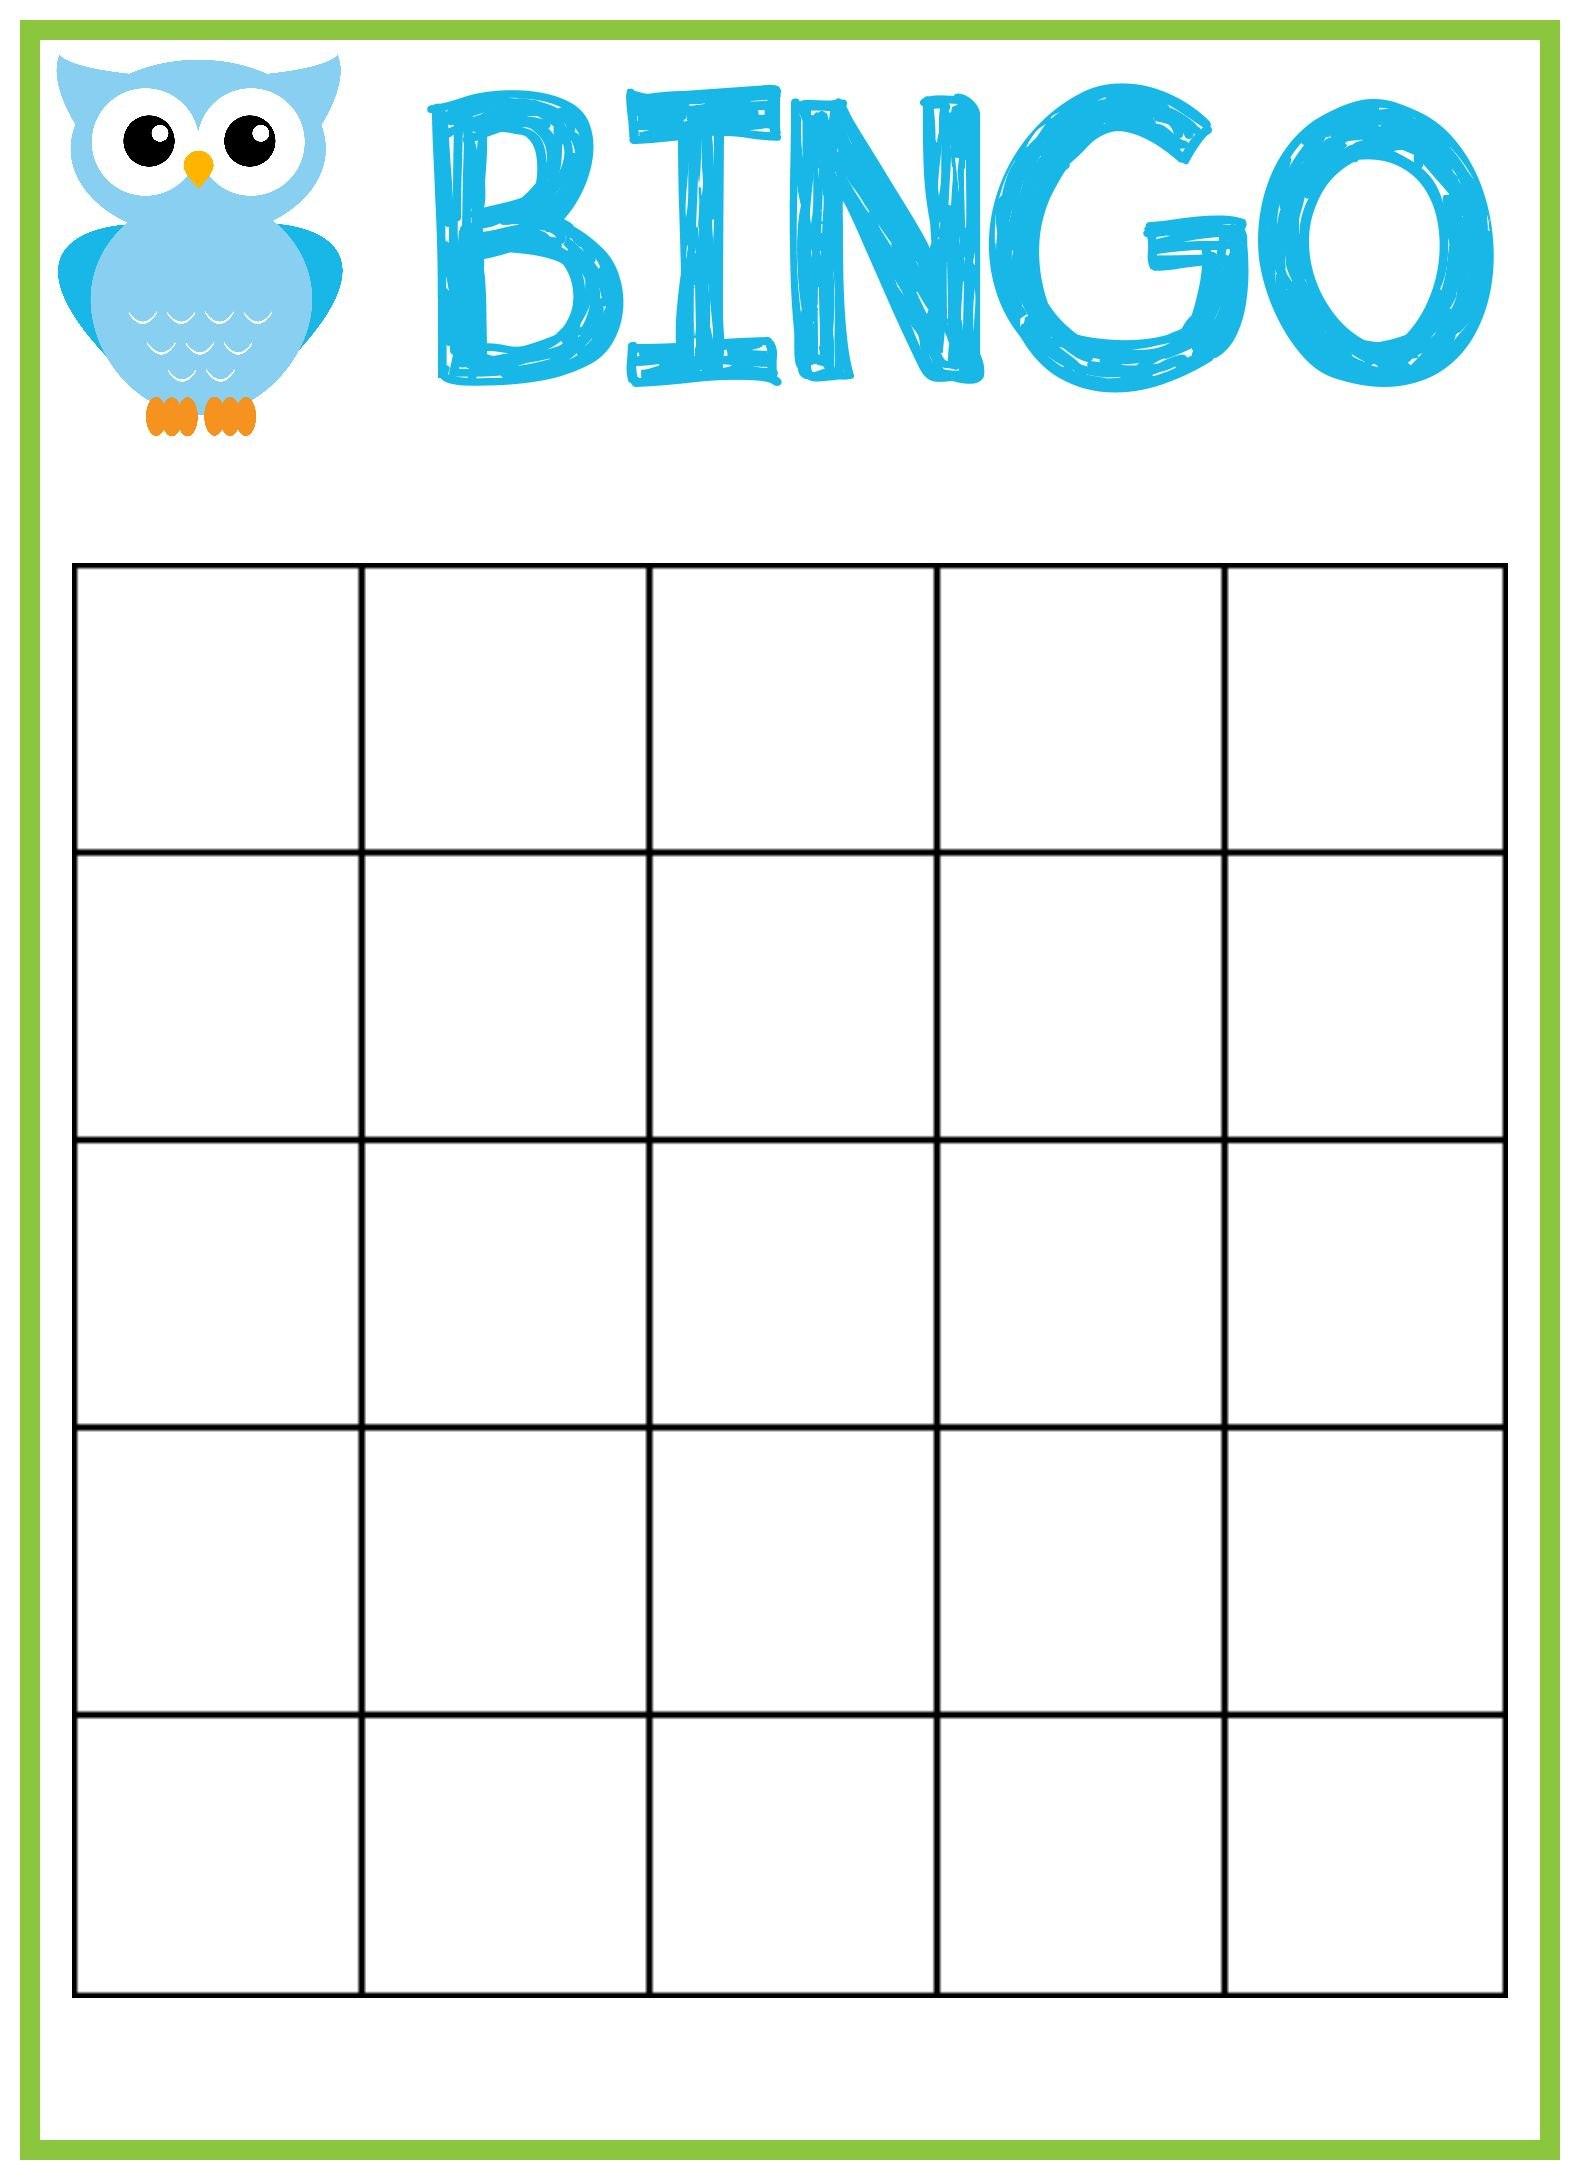 Free Printable Cards Word Blank Bingo Awesome Card Templates Regarding Bingo Card Template Word